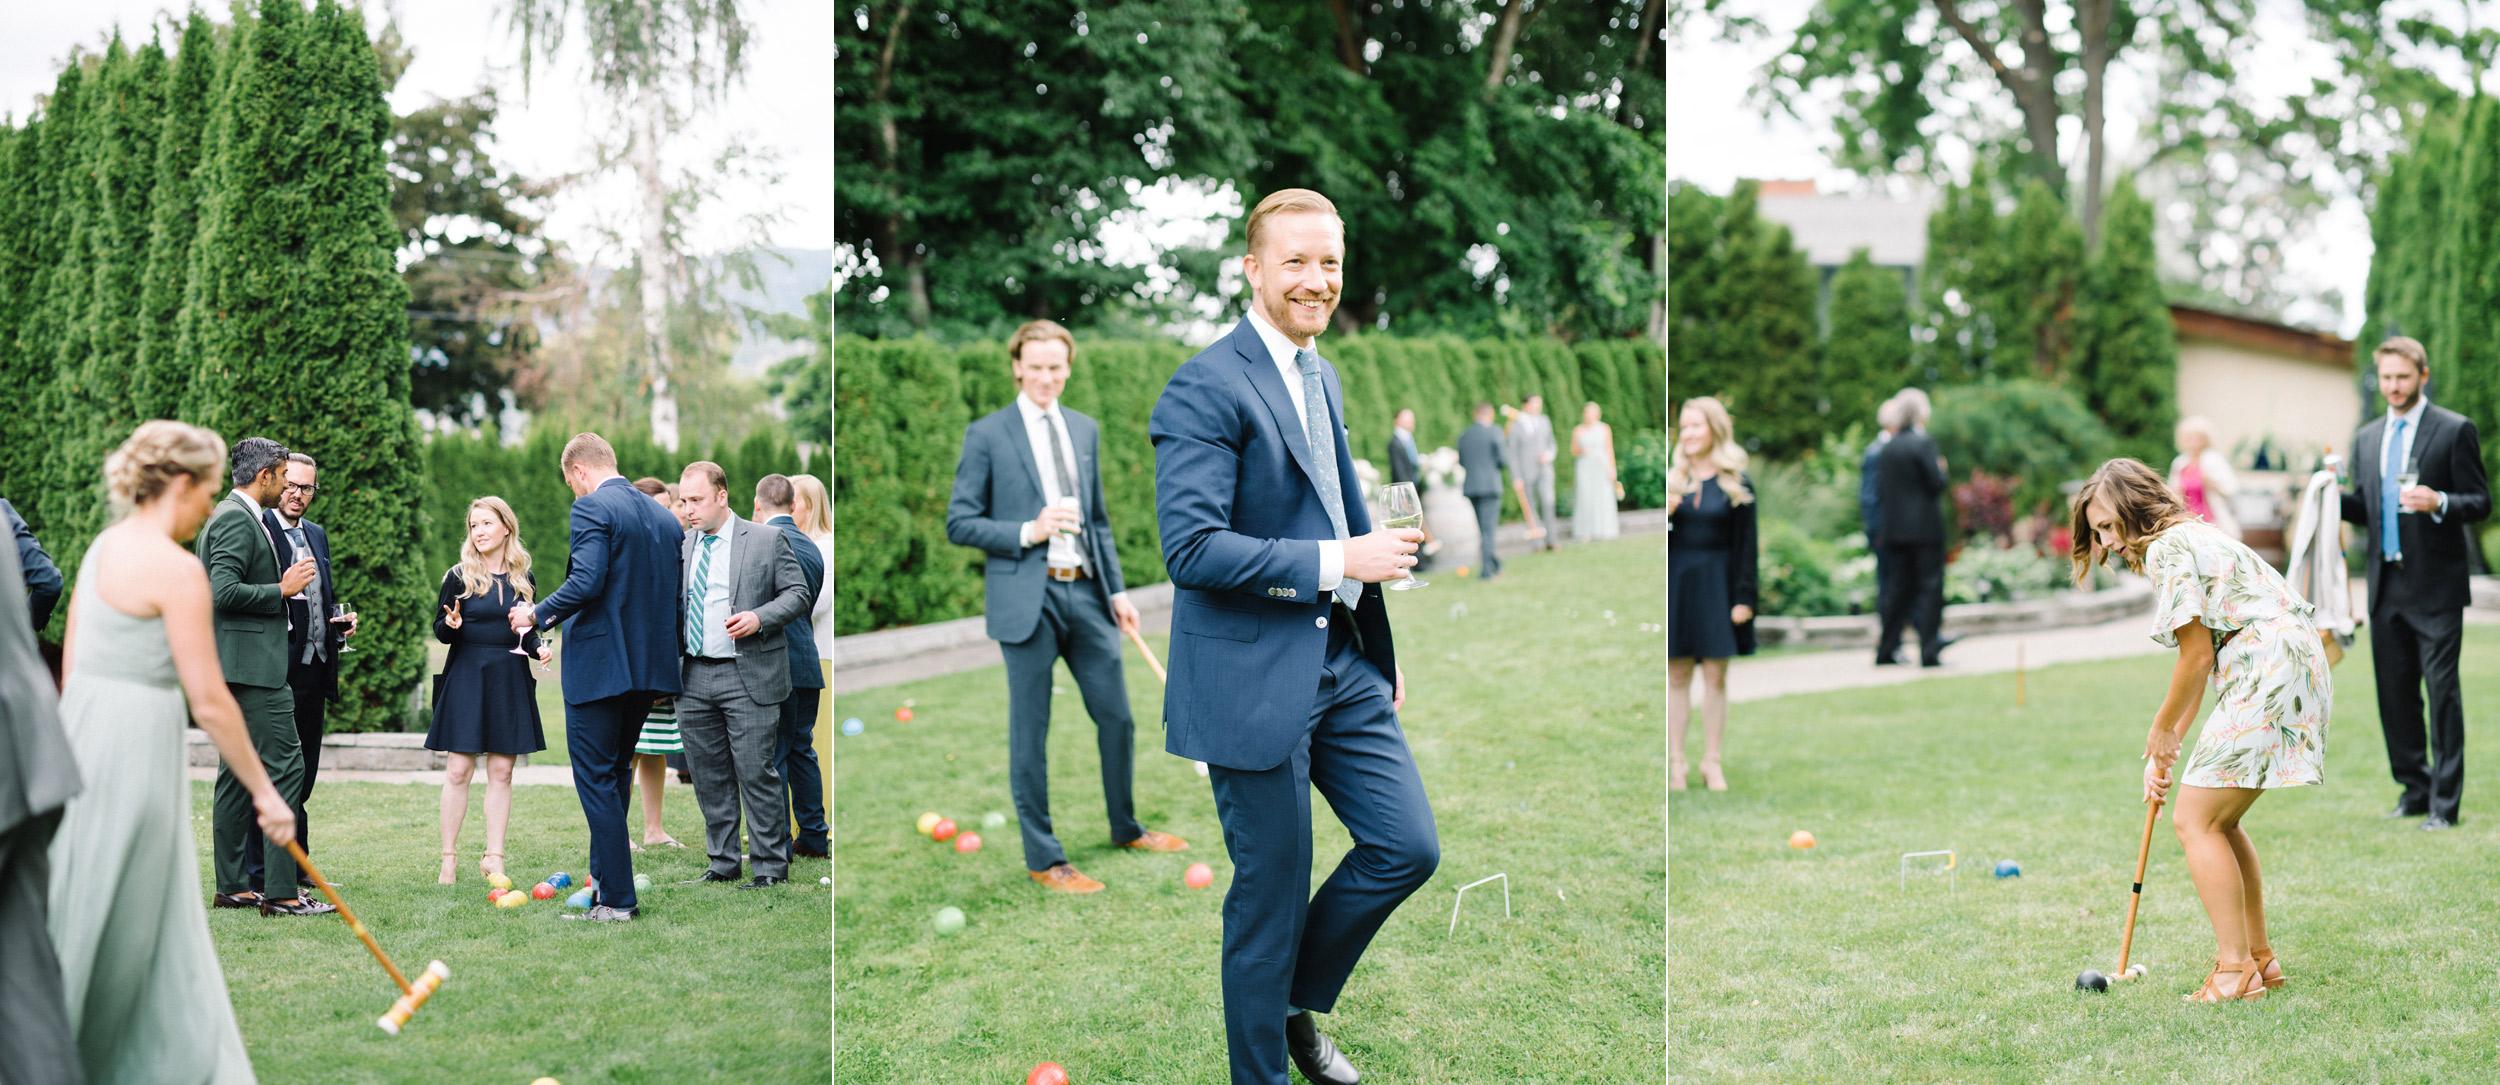 053-Okanagan_Wedding_Photographers.jpg